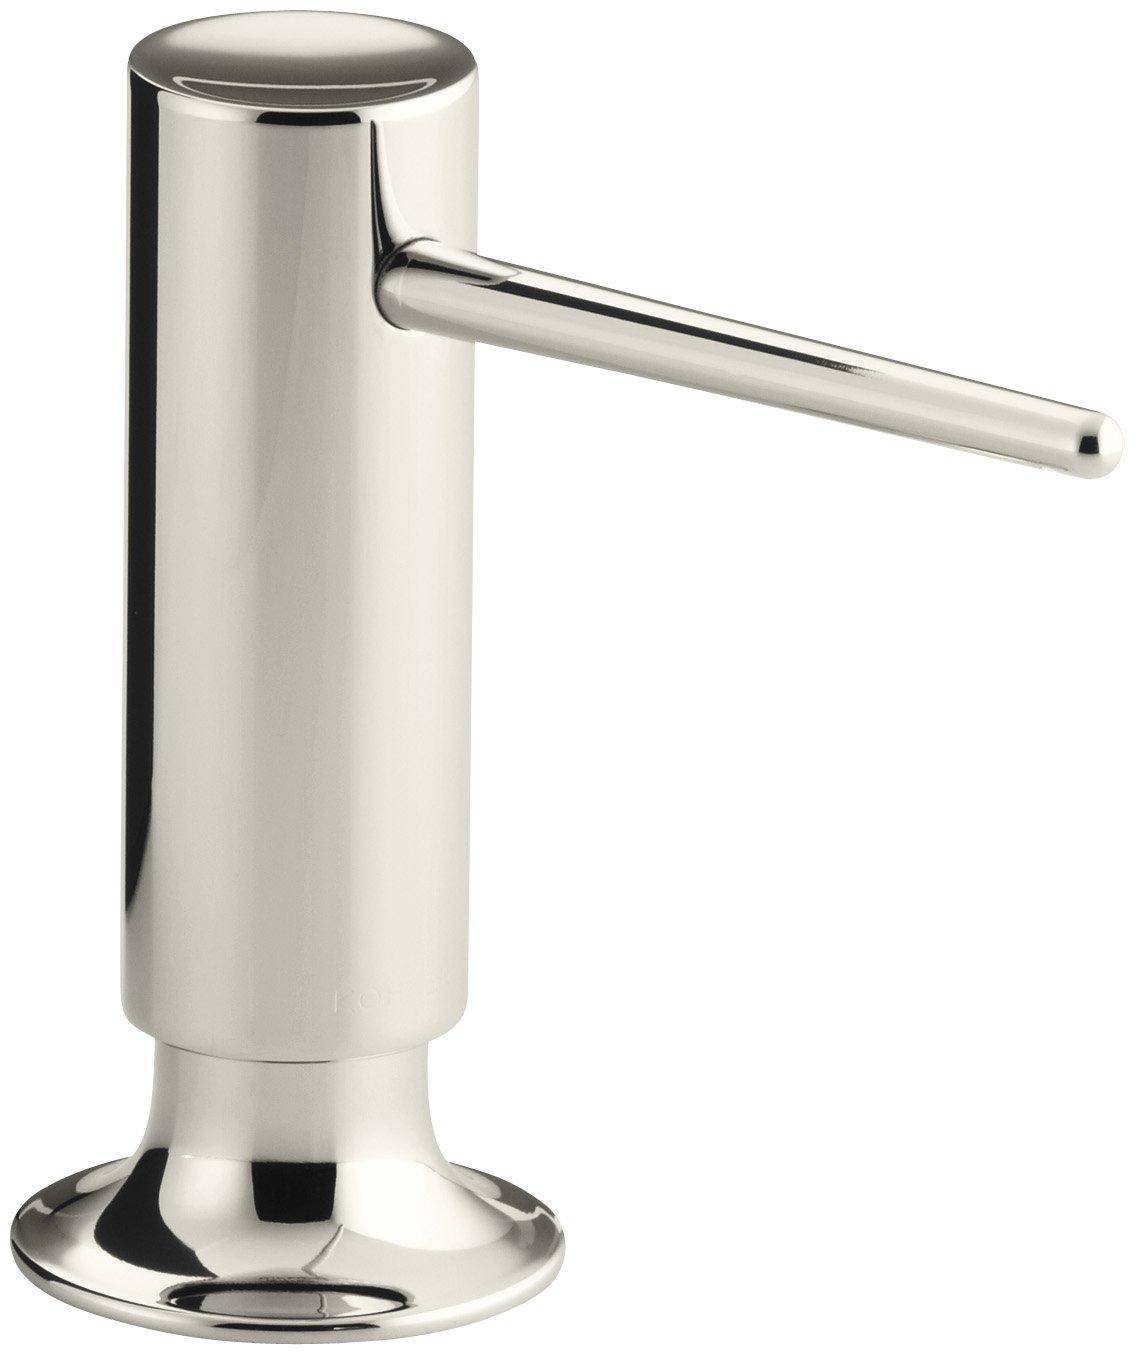 KOHLER K-1995-SN Contemporary Design Soap/Lotion Dispenser, Vibrant Polished Nickel